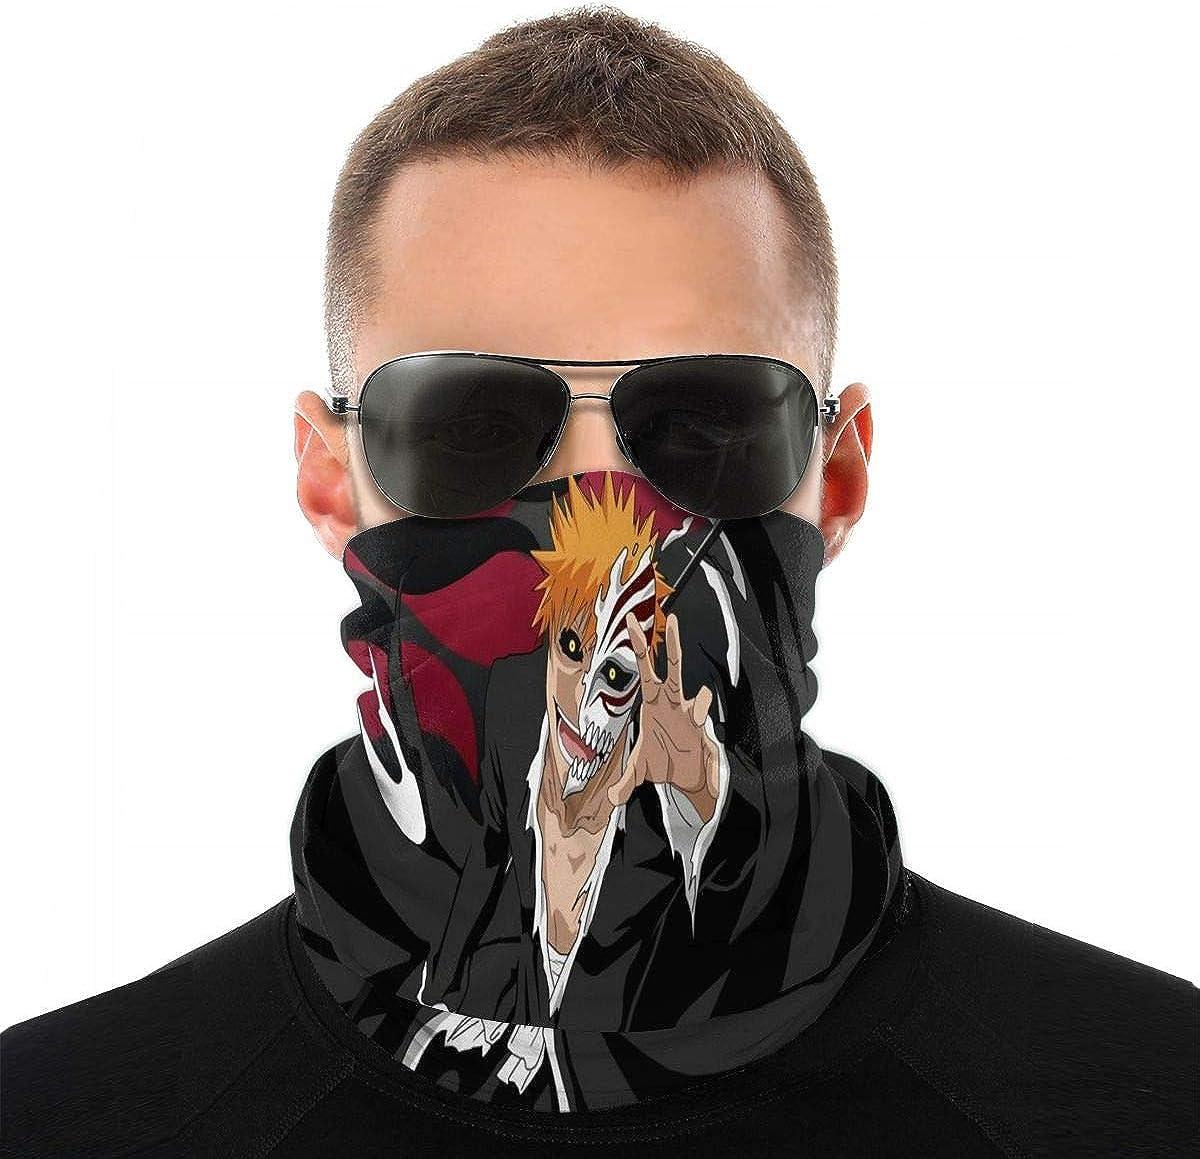 Ichigo Bleach Masks Red Black Halloween Costume Face Mask New Anime Manga